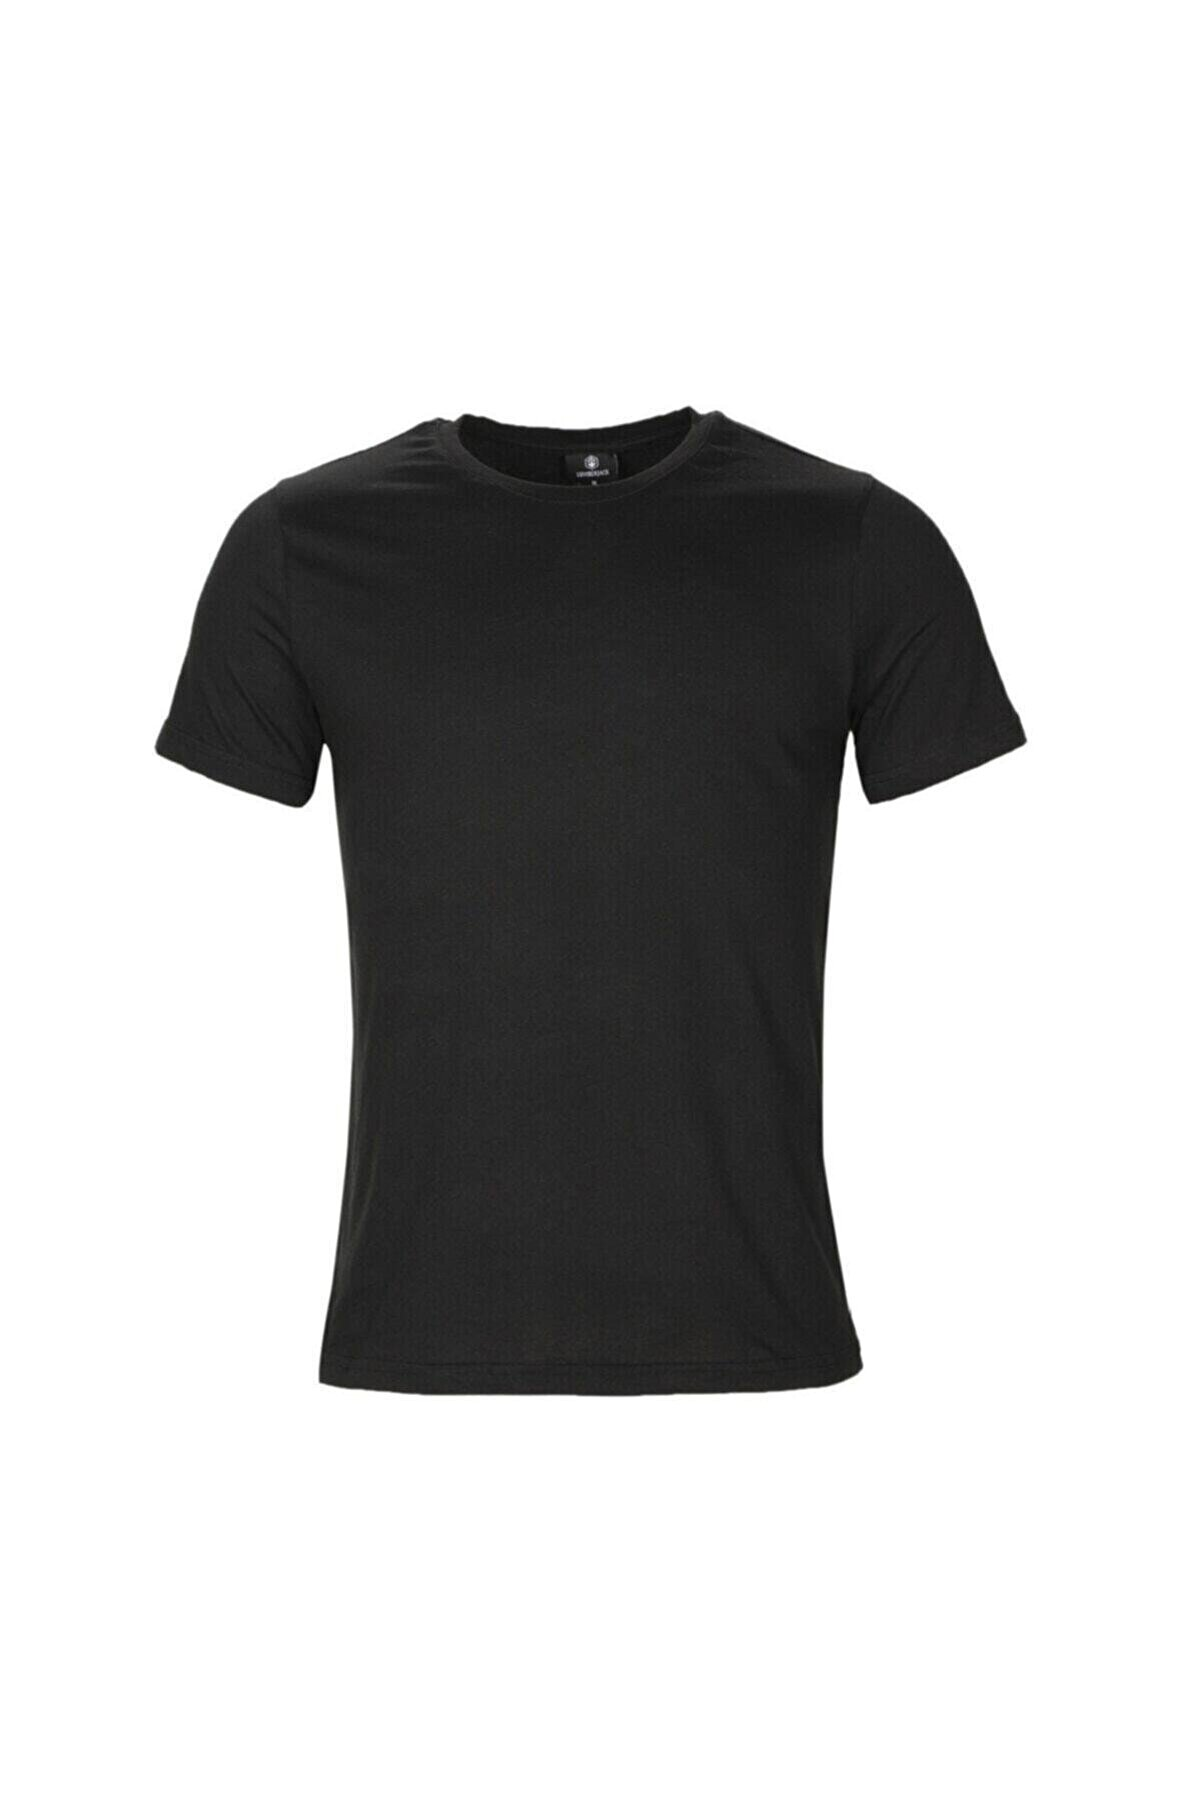 Lumberjack CT102 BASIC C NECK T-SHIR Siyah Erkek T-Shirt 100581714